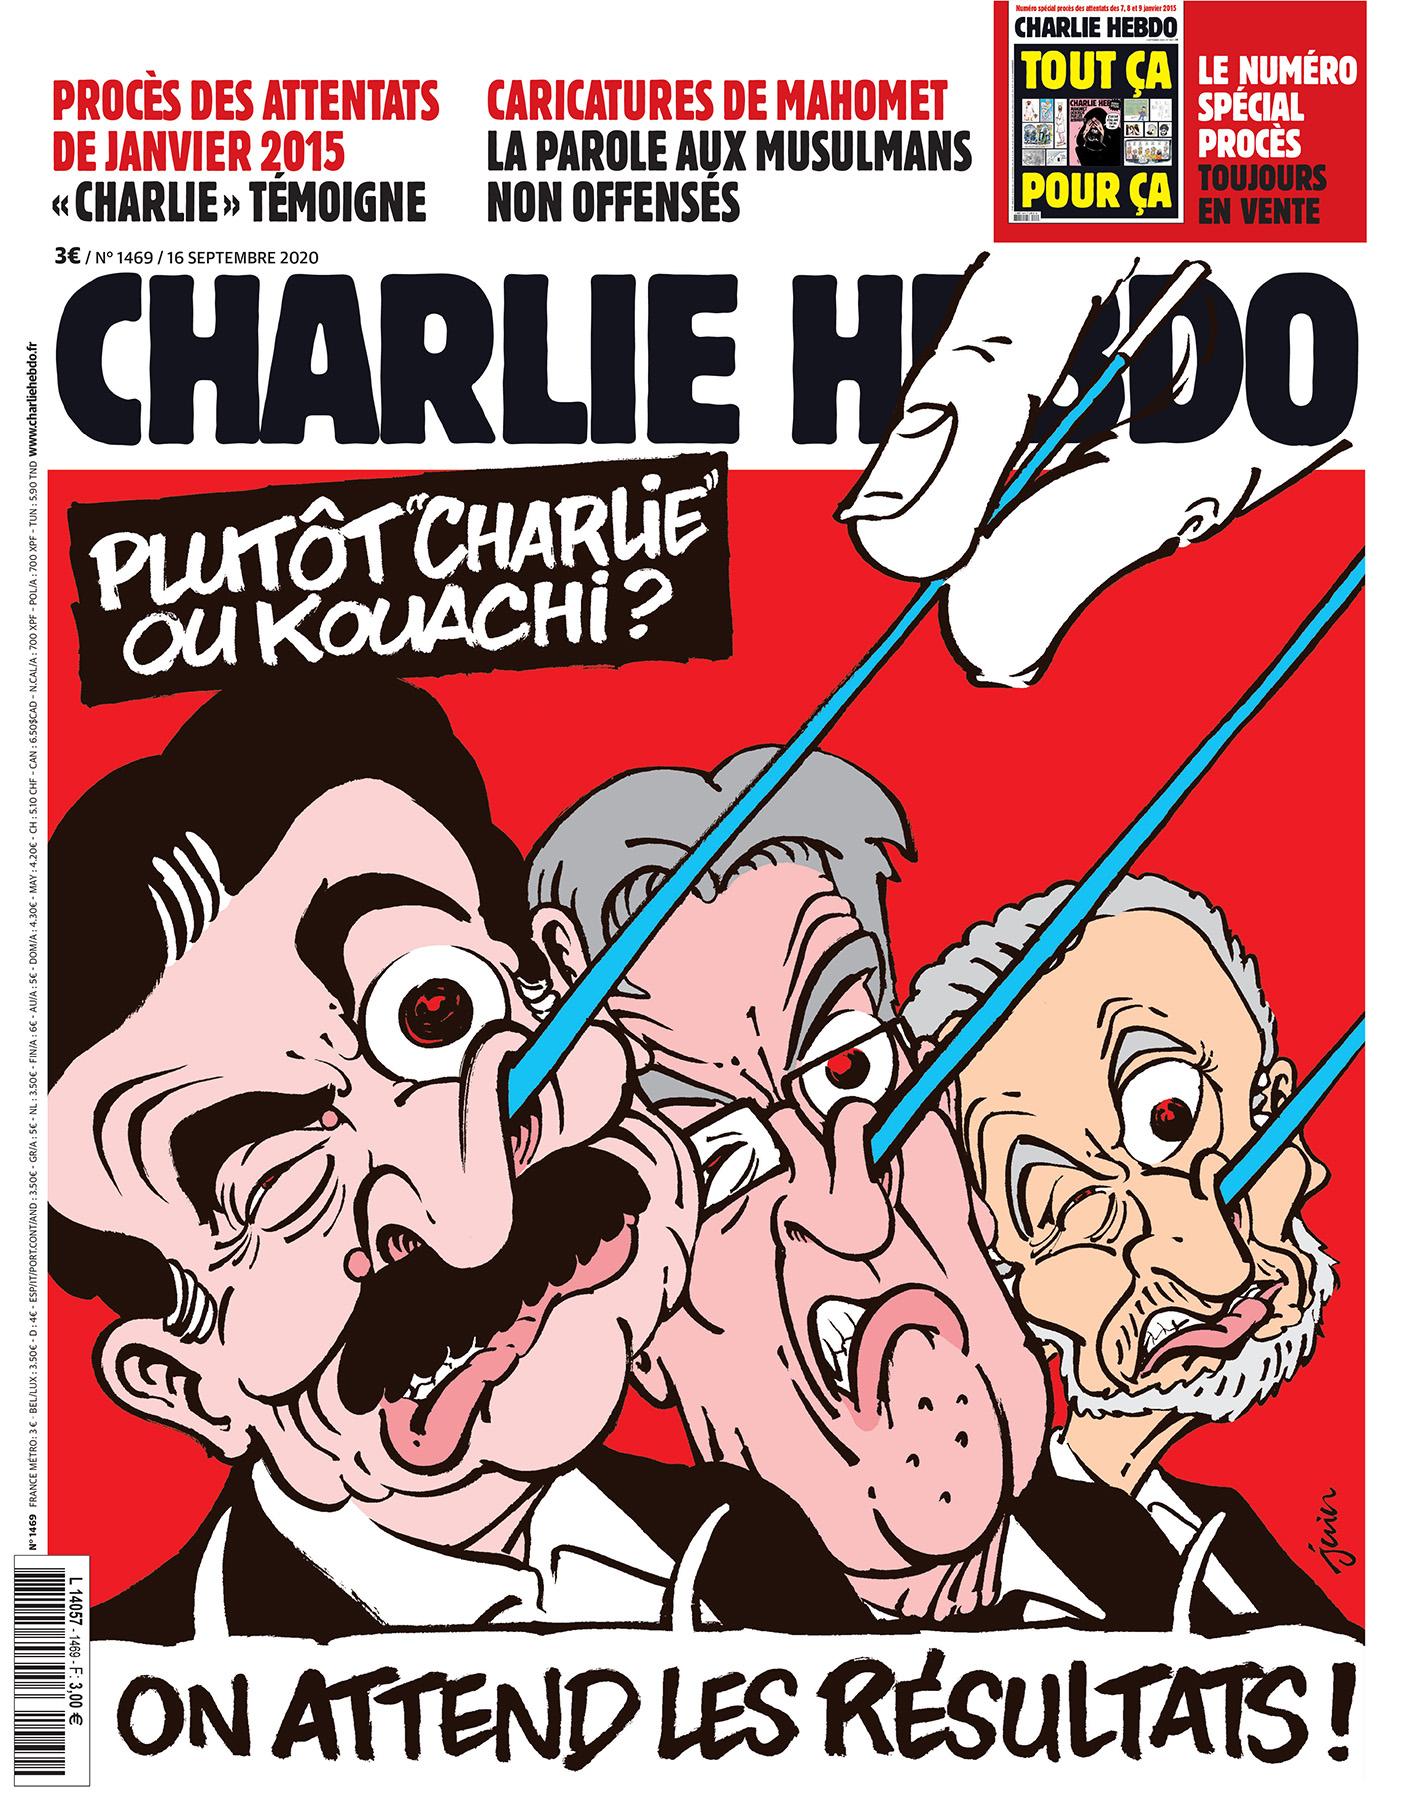 Charlie Hebdo n°1469 -- 16 septembre 2020 --- JUIN --- Plutôt Charlie ou Kouachi ?